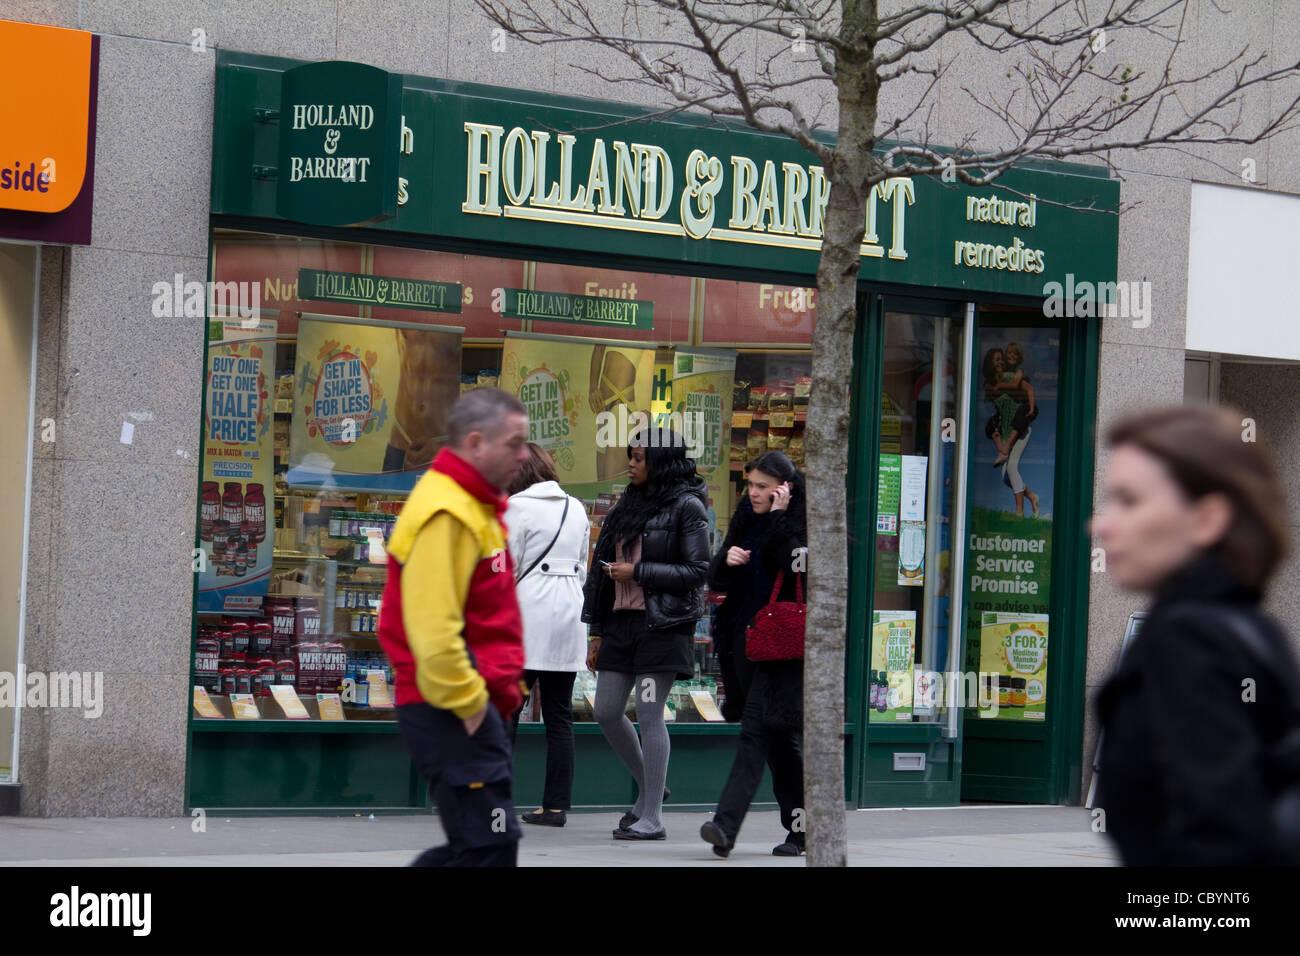 Holland and Barrett health food shop, retailer of vitamins